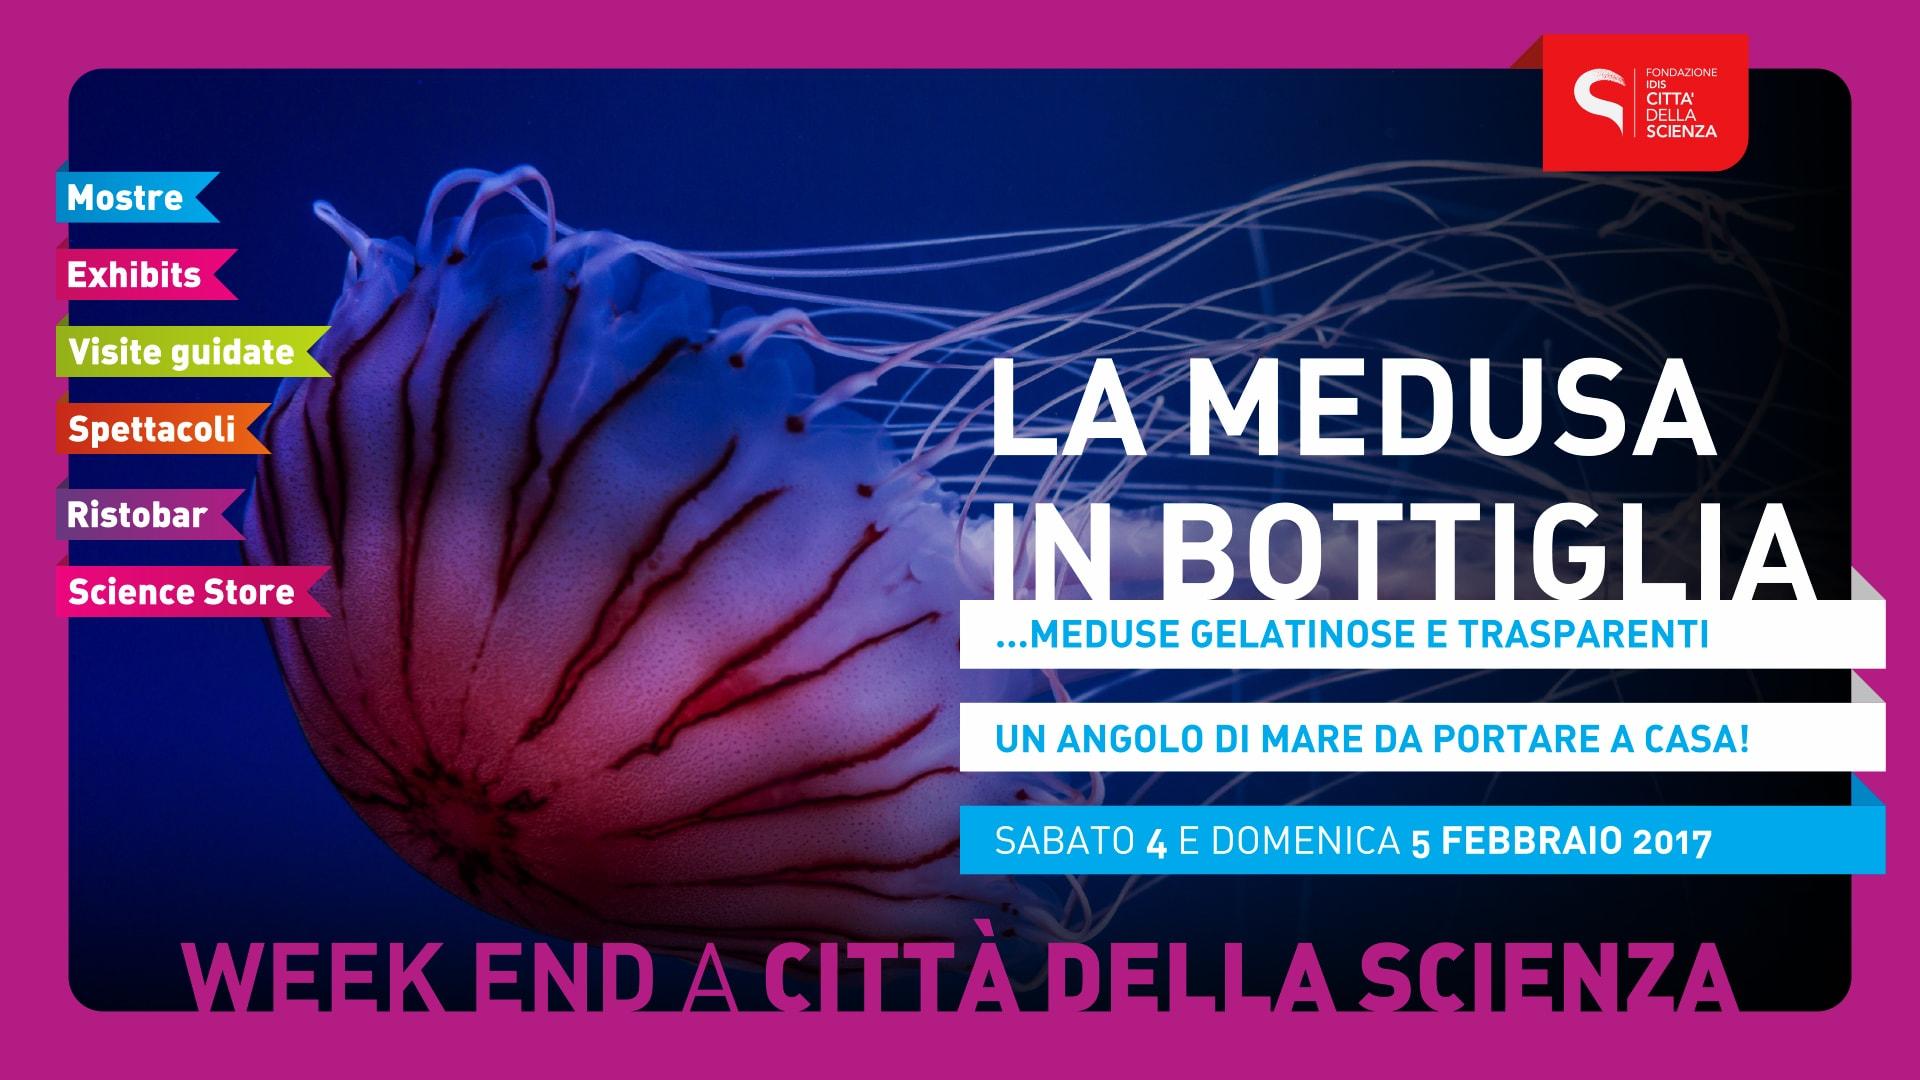 LA_MEDUSA_IN_BOTTIGLIA_1920_x_1080-min